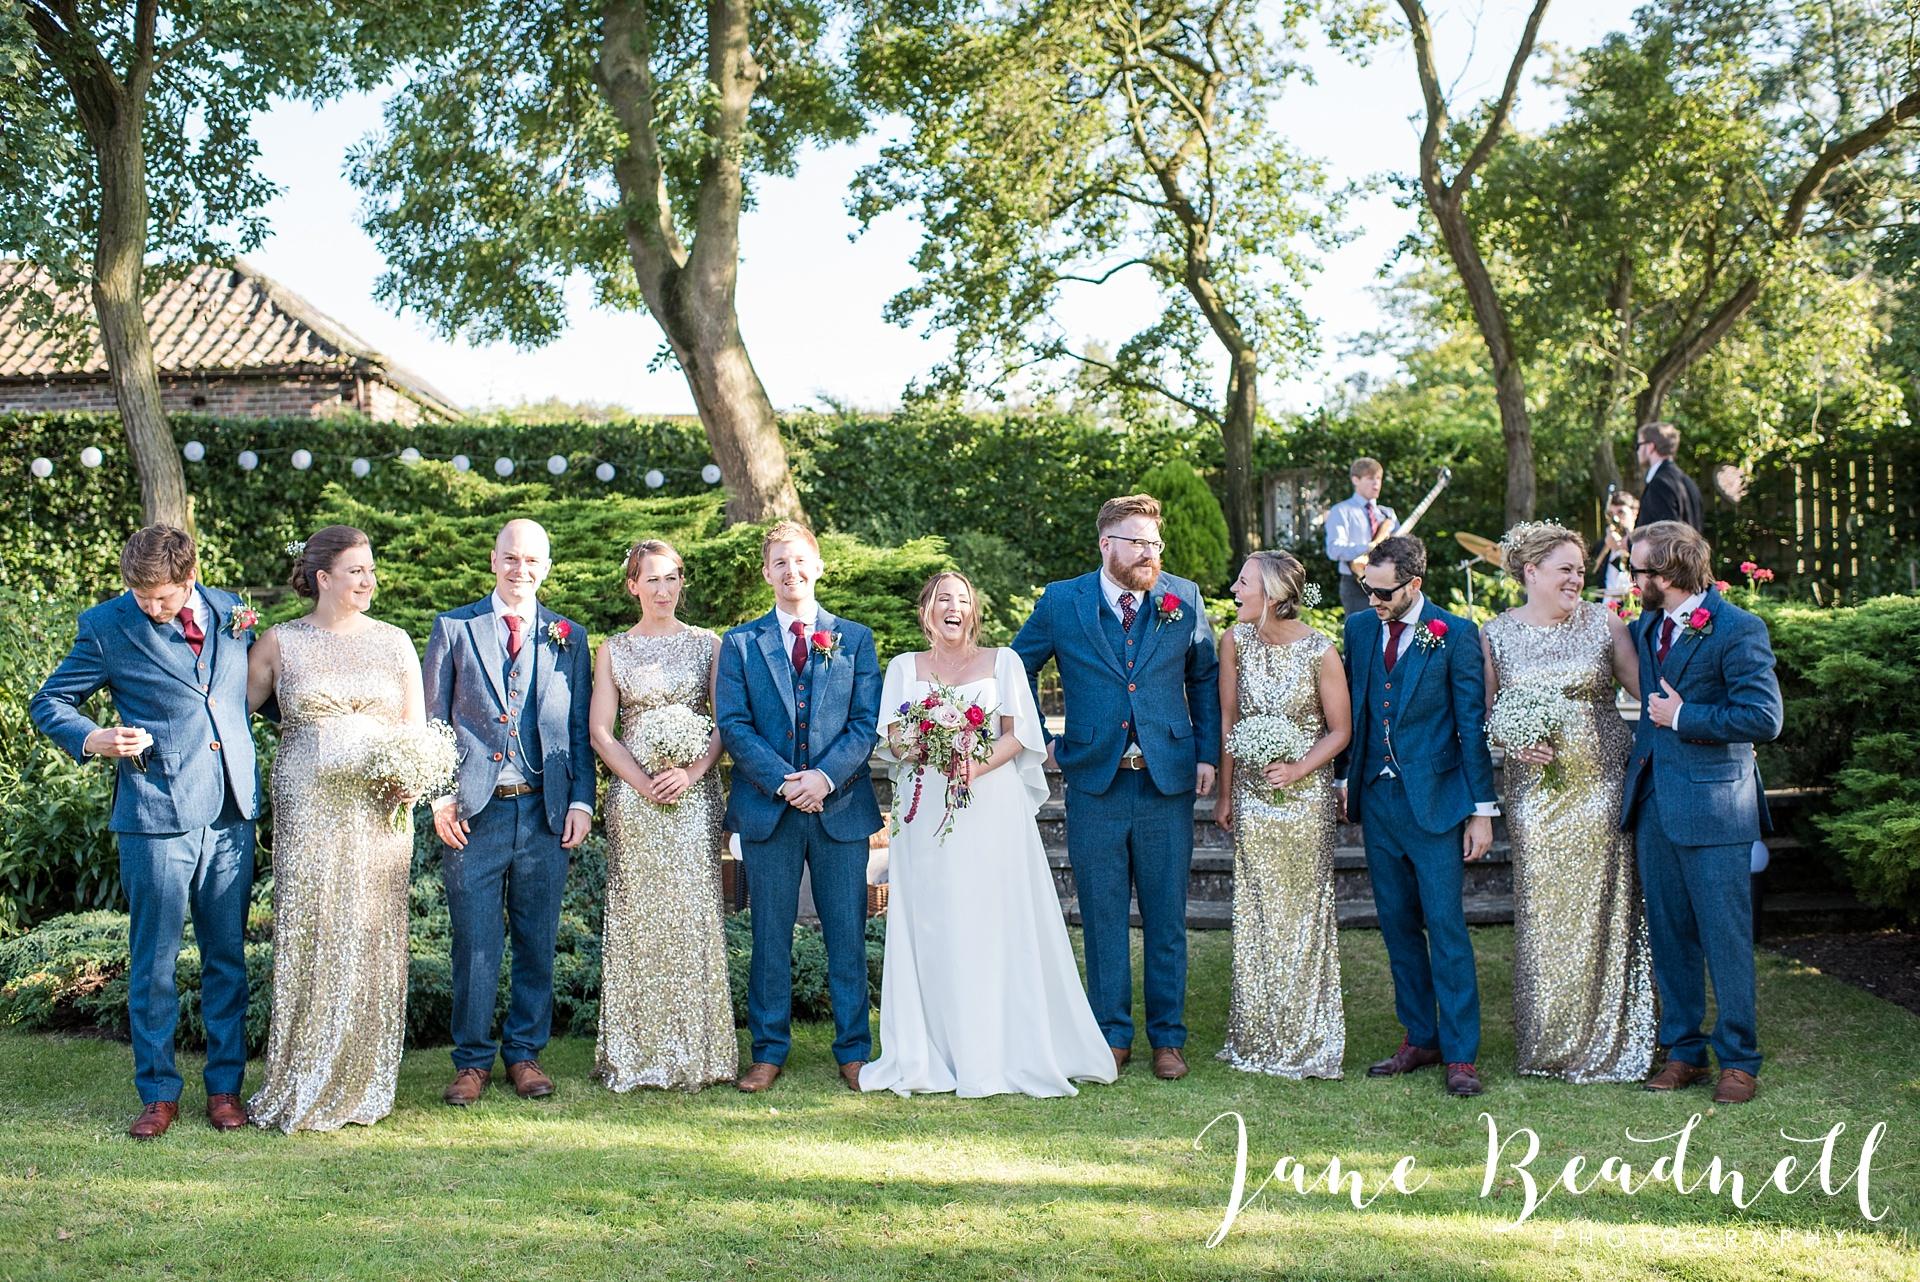 fine-art-wedding-photographer-jane-beadnell-yorkshire-wedding-photographer_0113